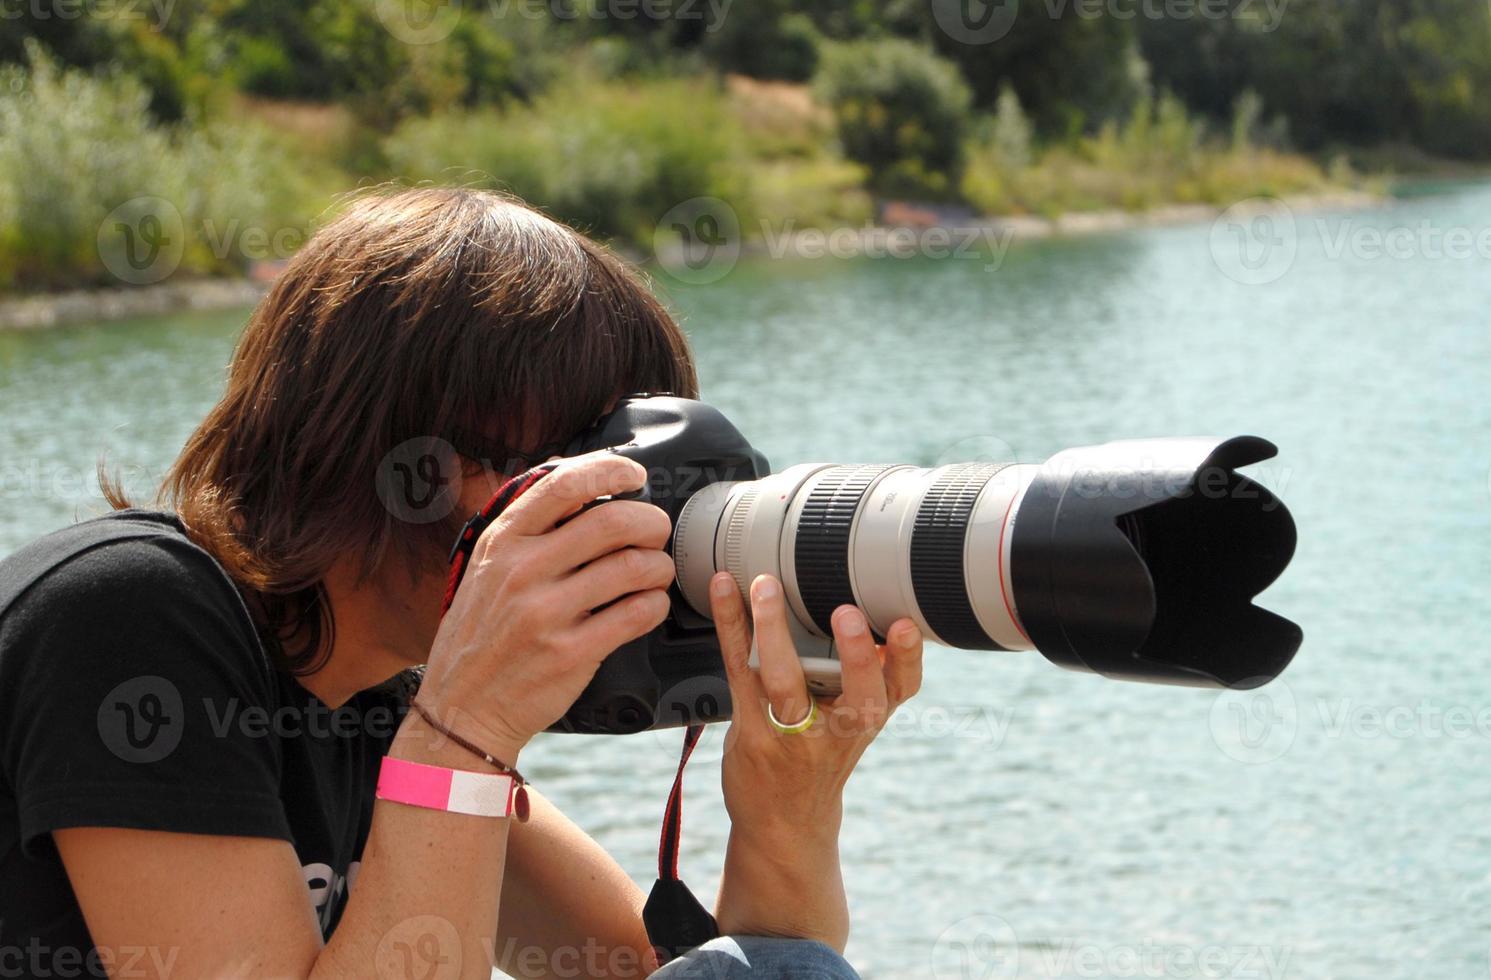 kvinnliga paparazzi foto